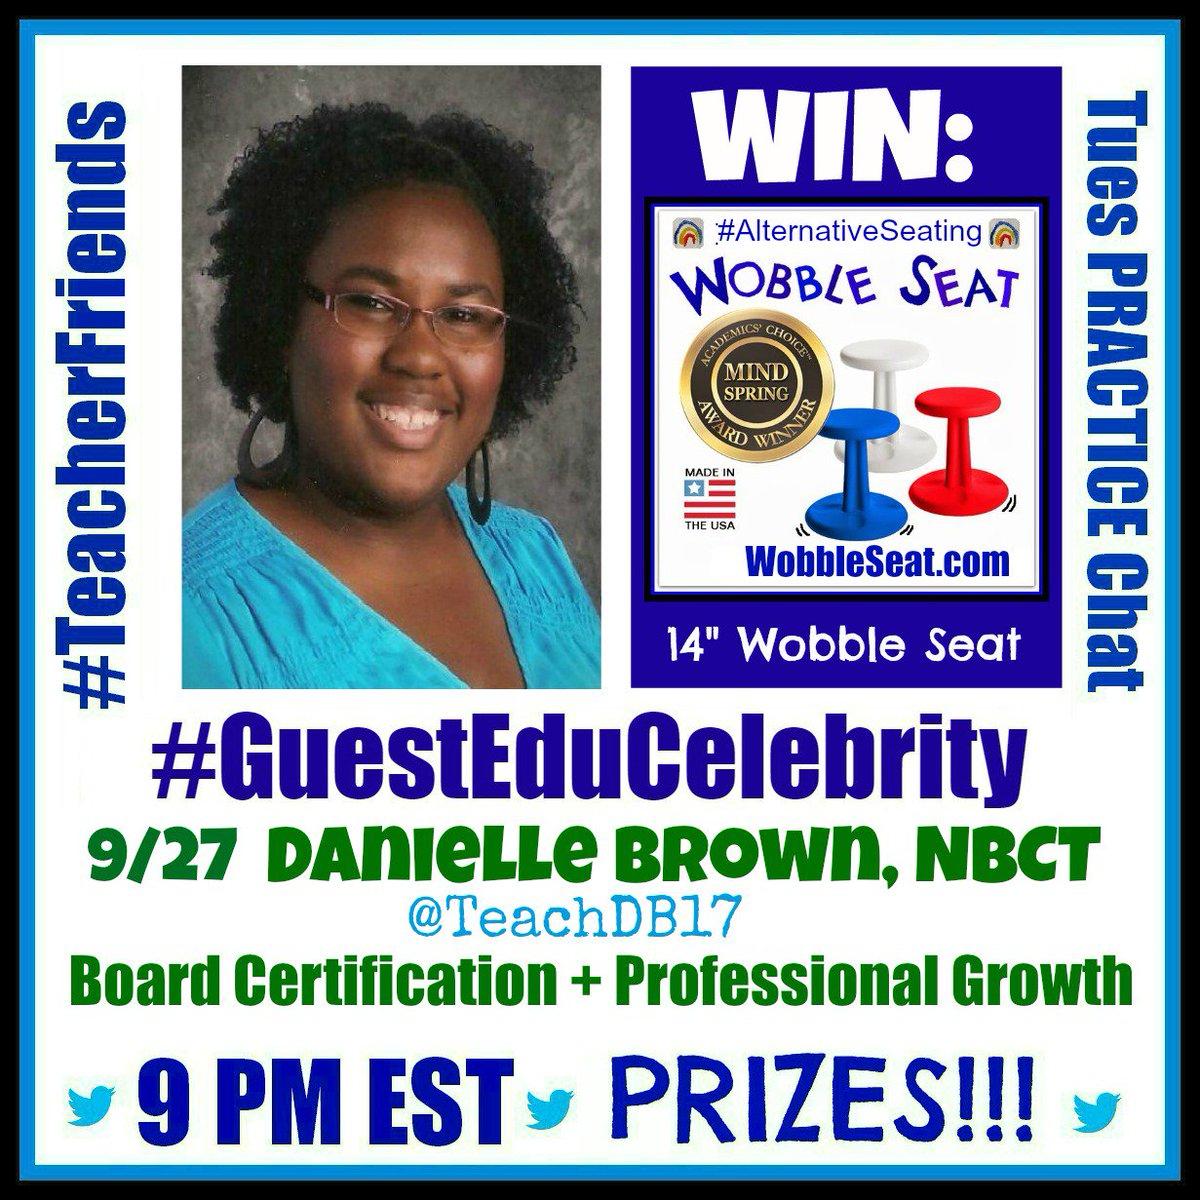 #TeacherFriends Next 9/27 welcome Danielle @TeachDB17 Join us! Please ReTweet! WIN: @WobbleSeat https://t.co/wGw5c6qKWD